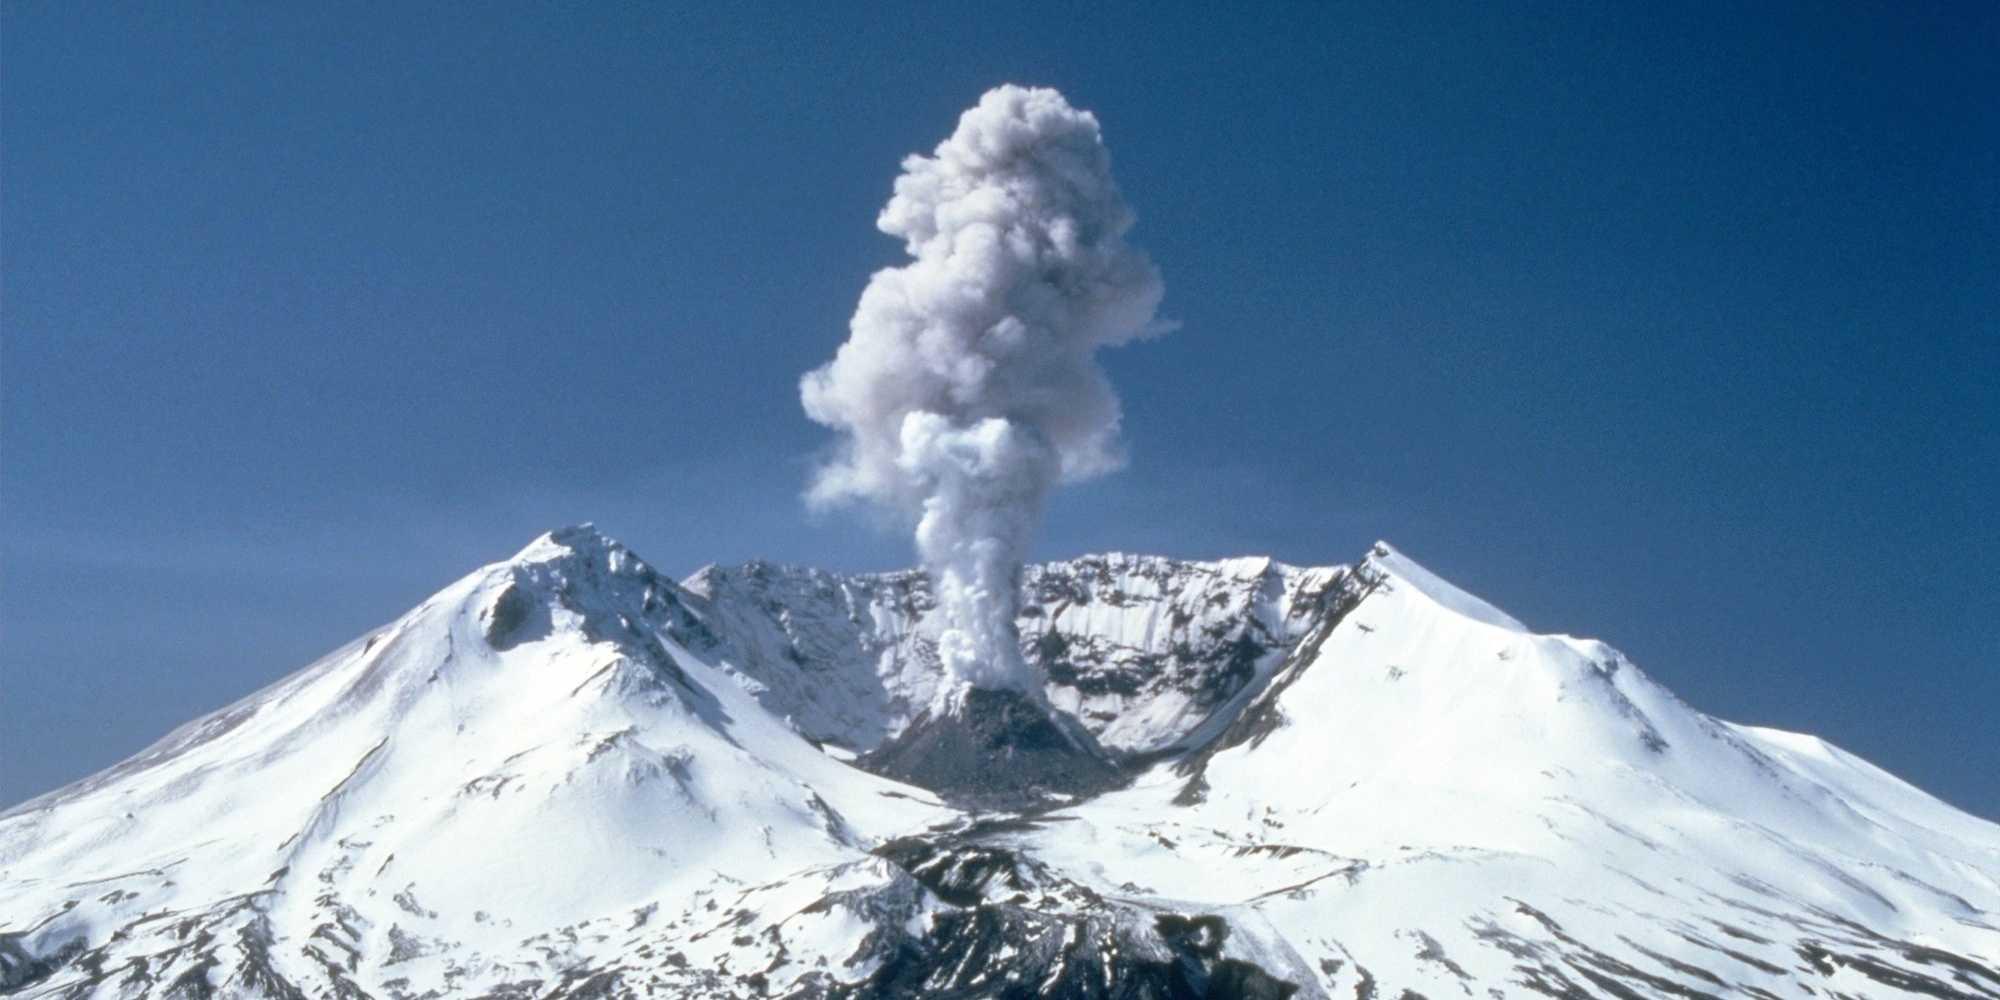 Volcán de América del Norte